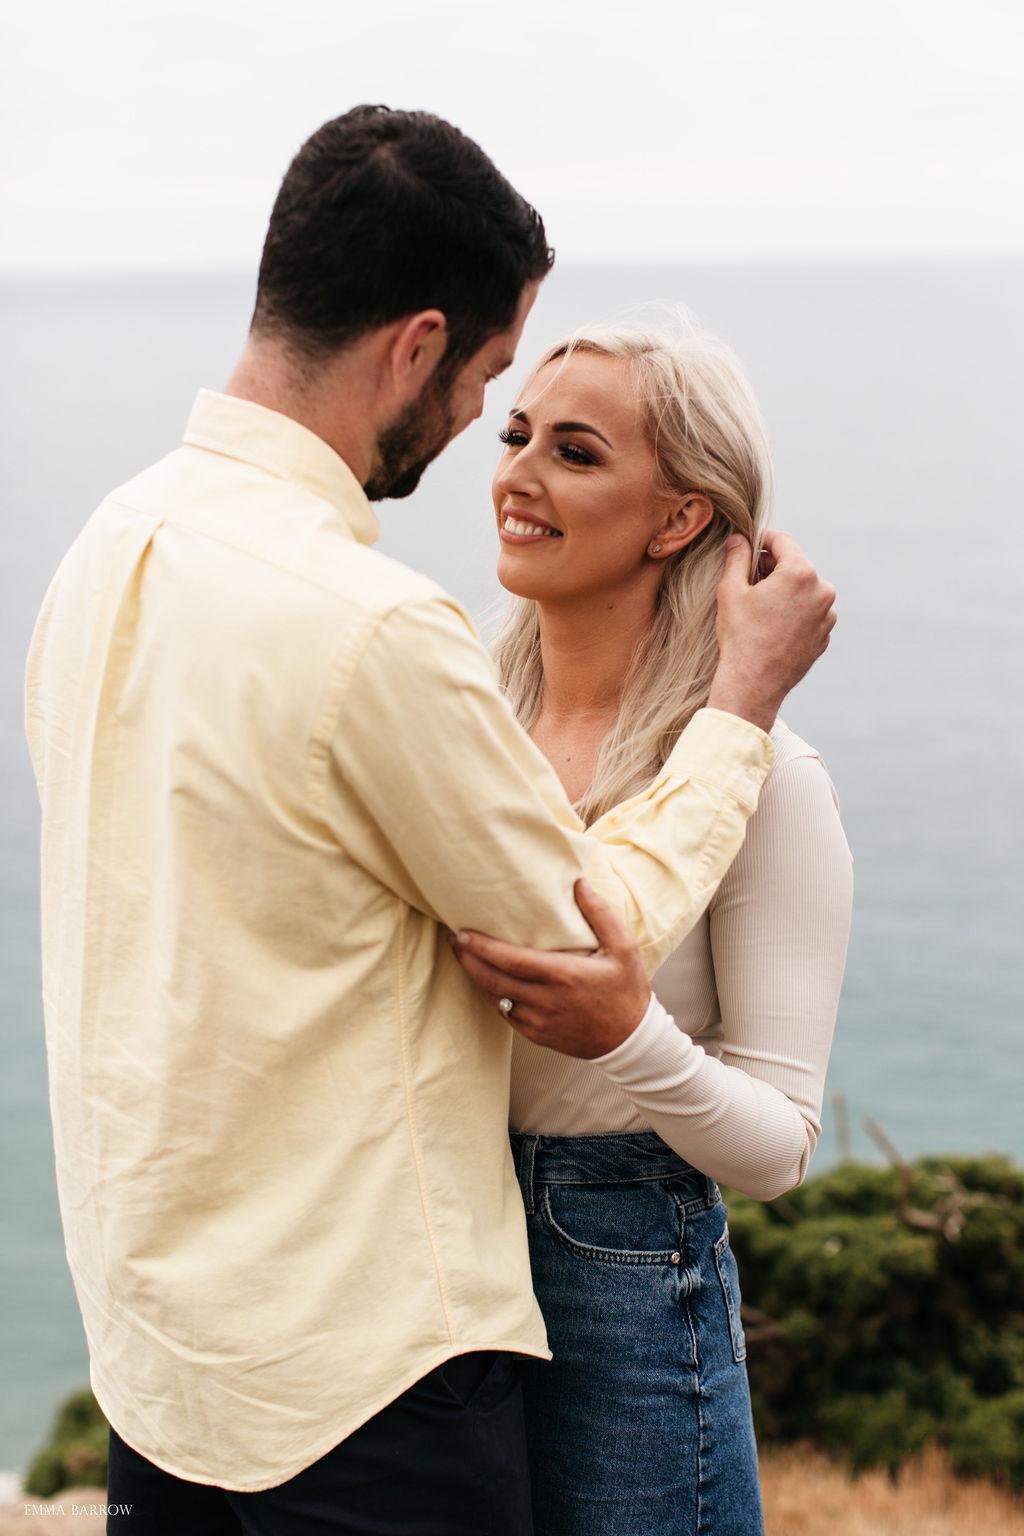 emma barrow pre wedding photographer proposal engagement gala rock salcombe plymouth